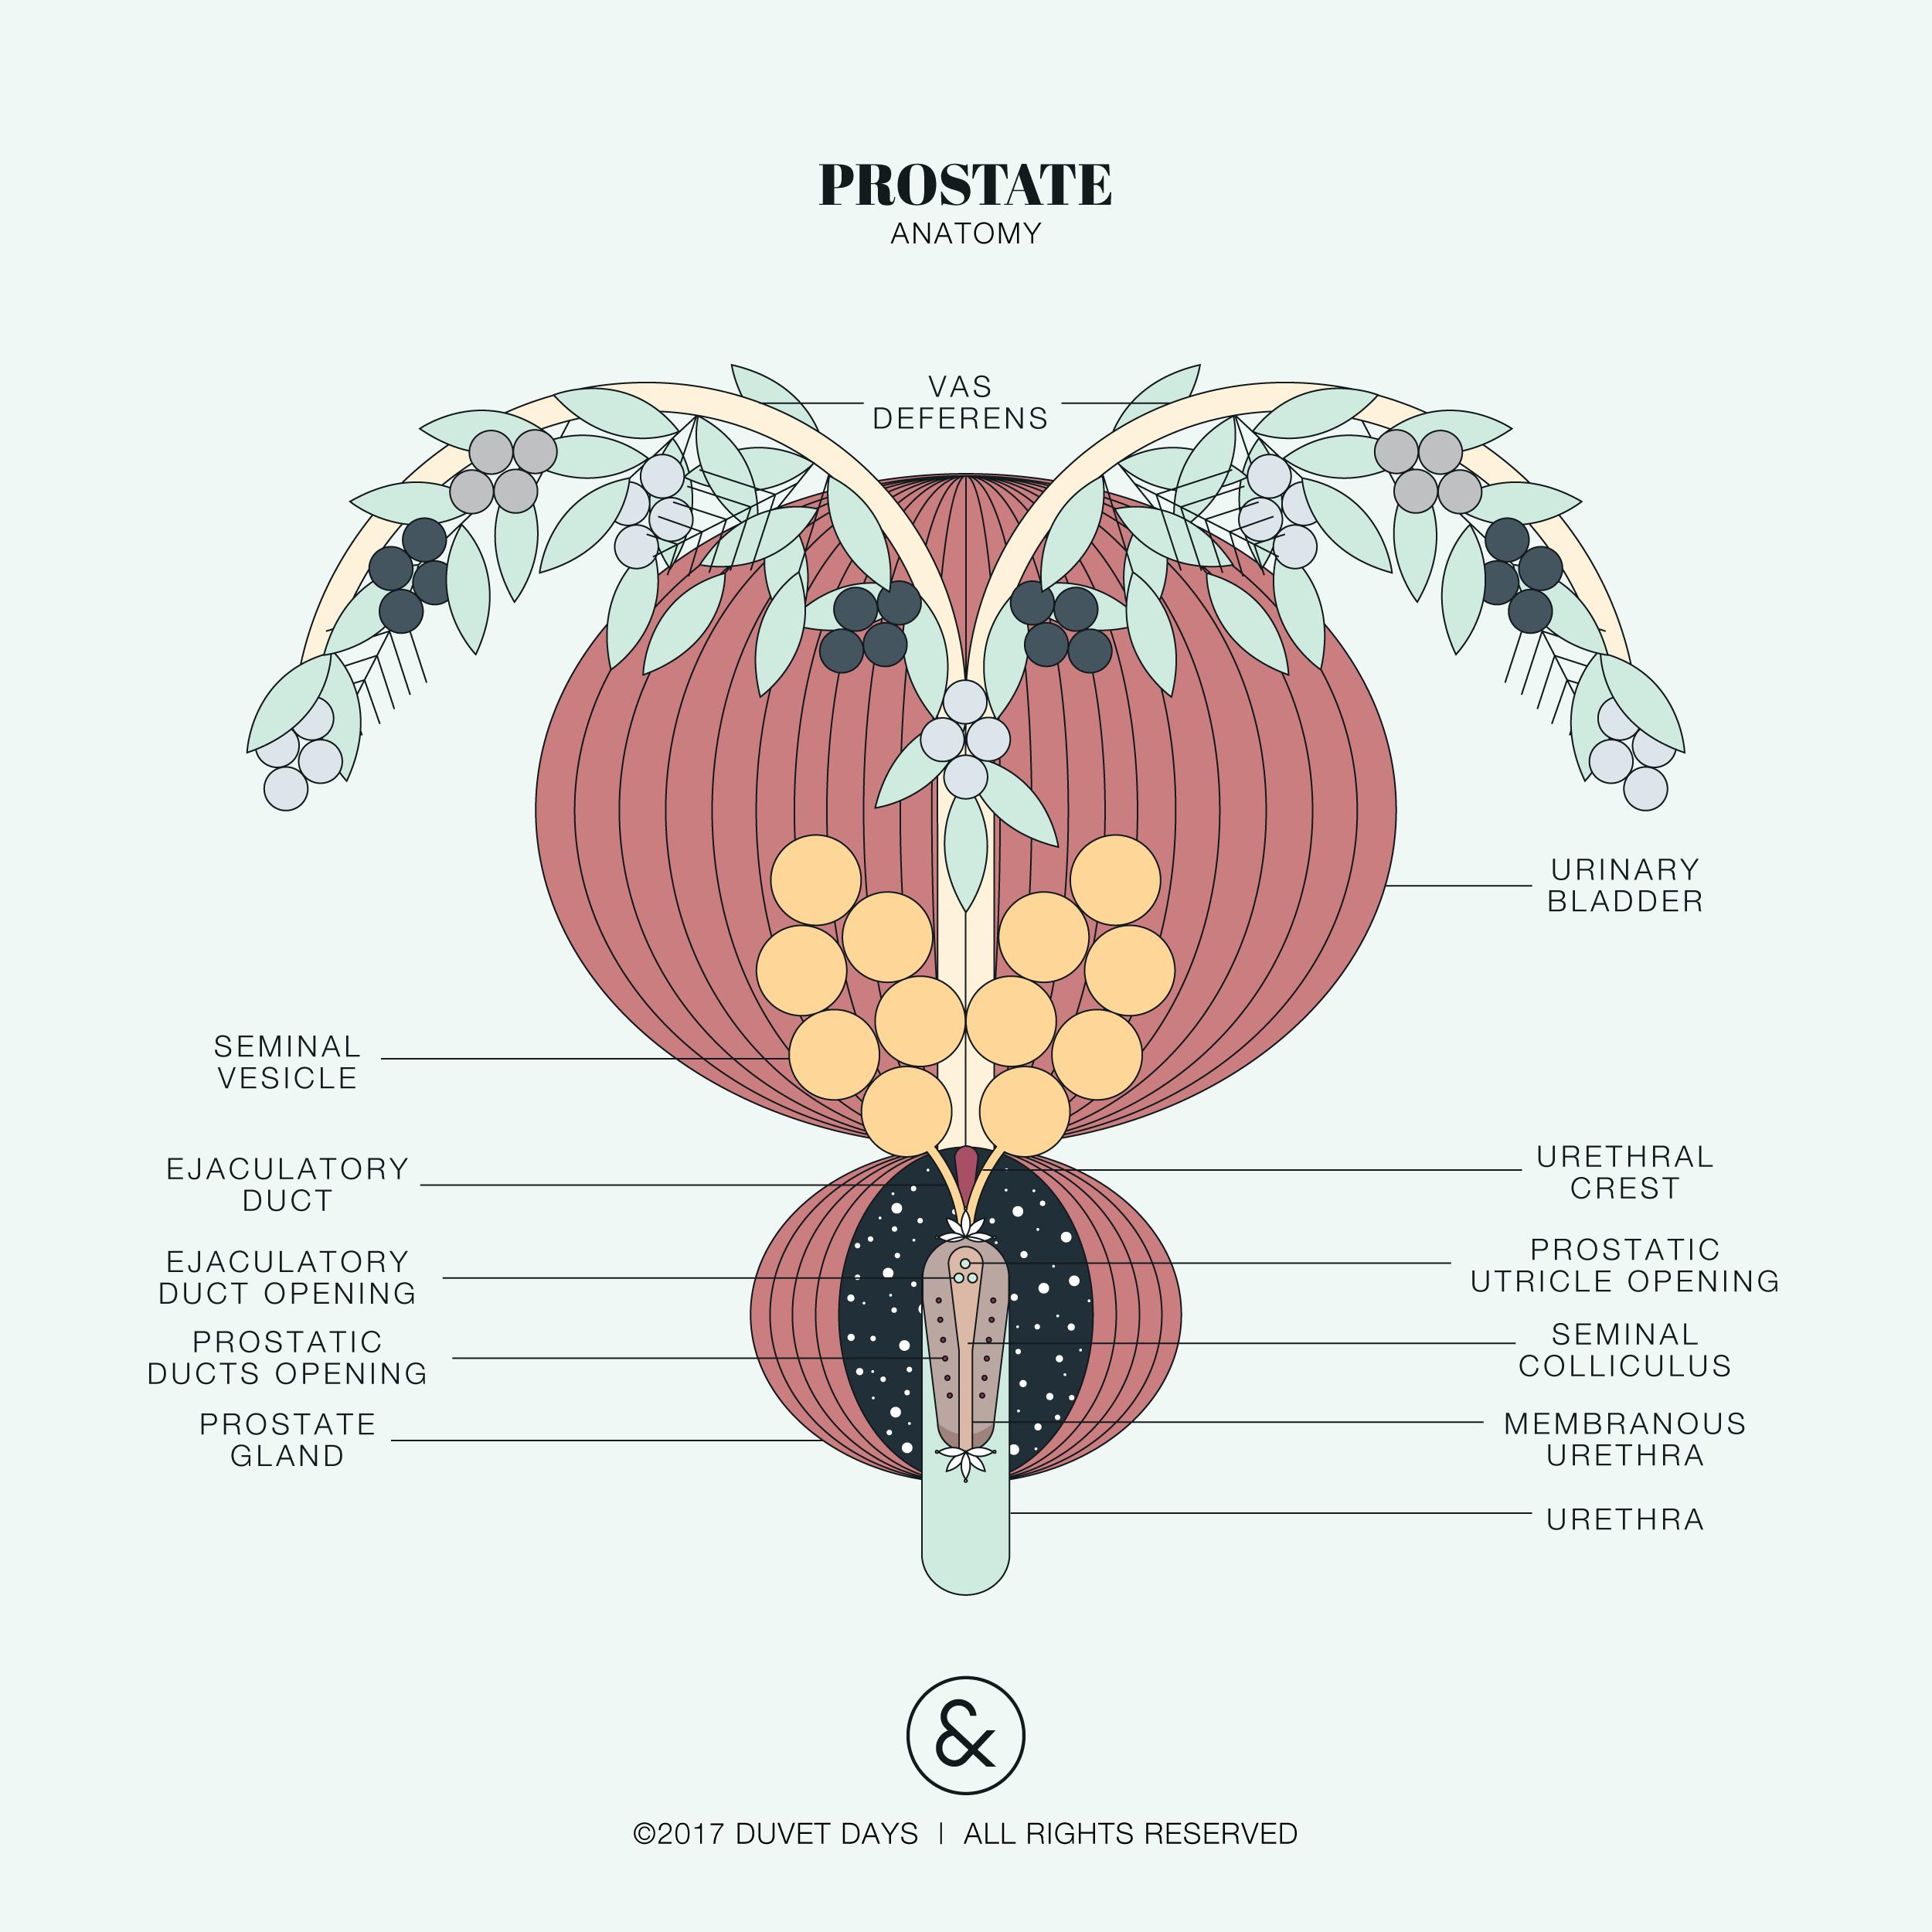 Prostate Anatomy Illustration Please Email Helloduvetdays For